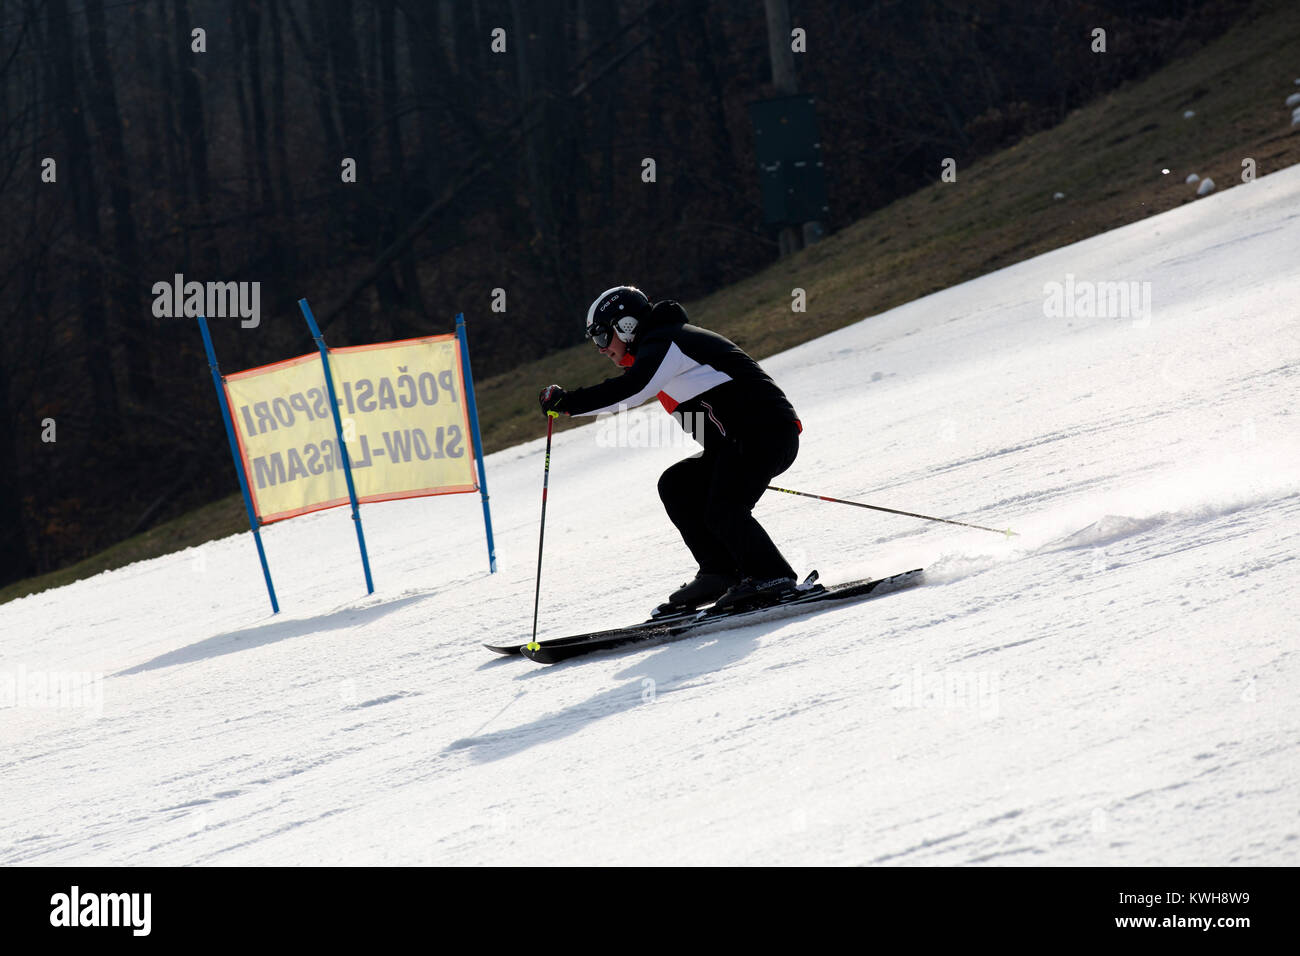 Skiing on a piste at the Maribor Pohorje Ski Resort near Maribor, Slovenia. The resort hosts the Golden Fox ski - Stock Image